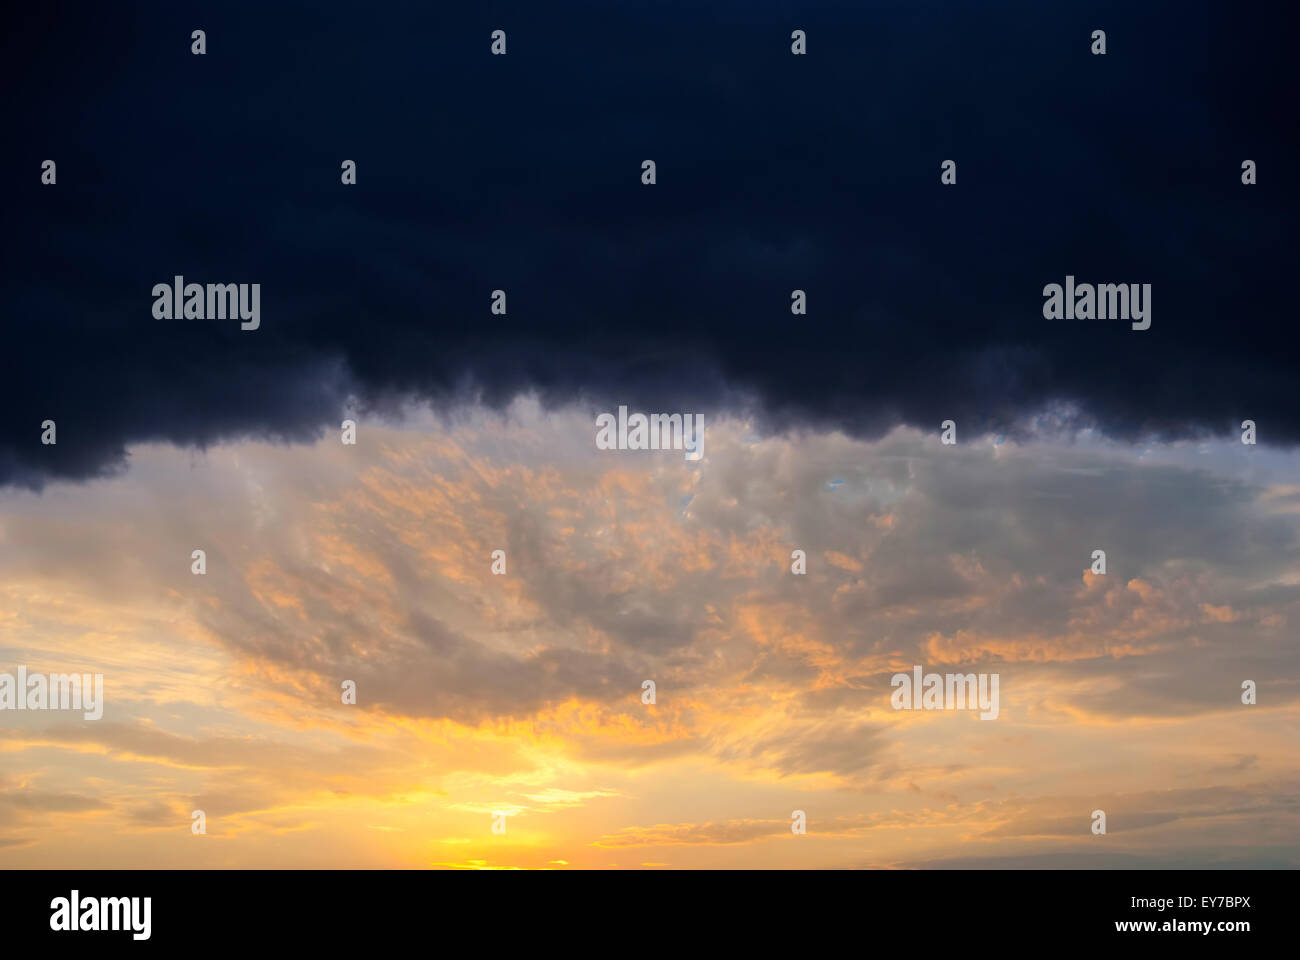 Huge rain cloud lit orange sunset - Stock Image